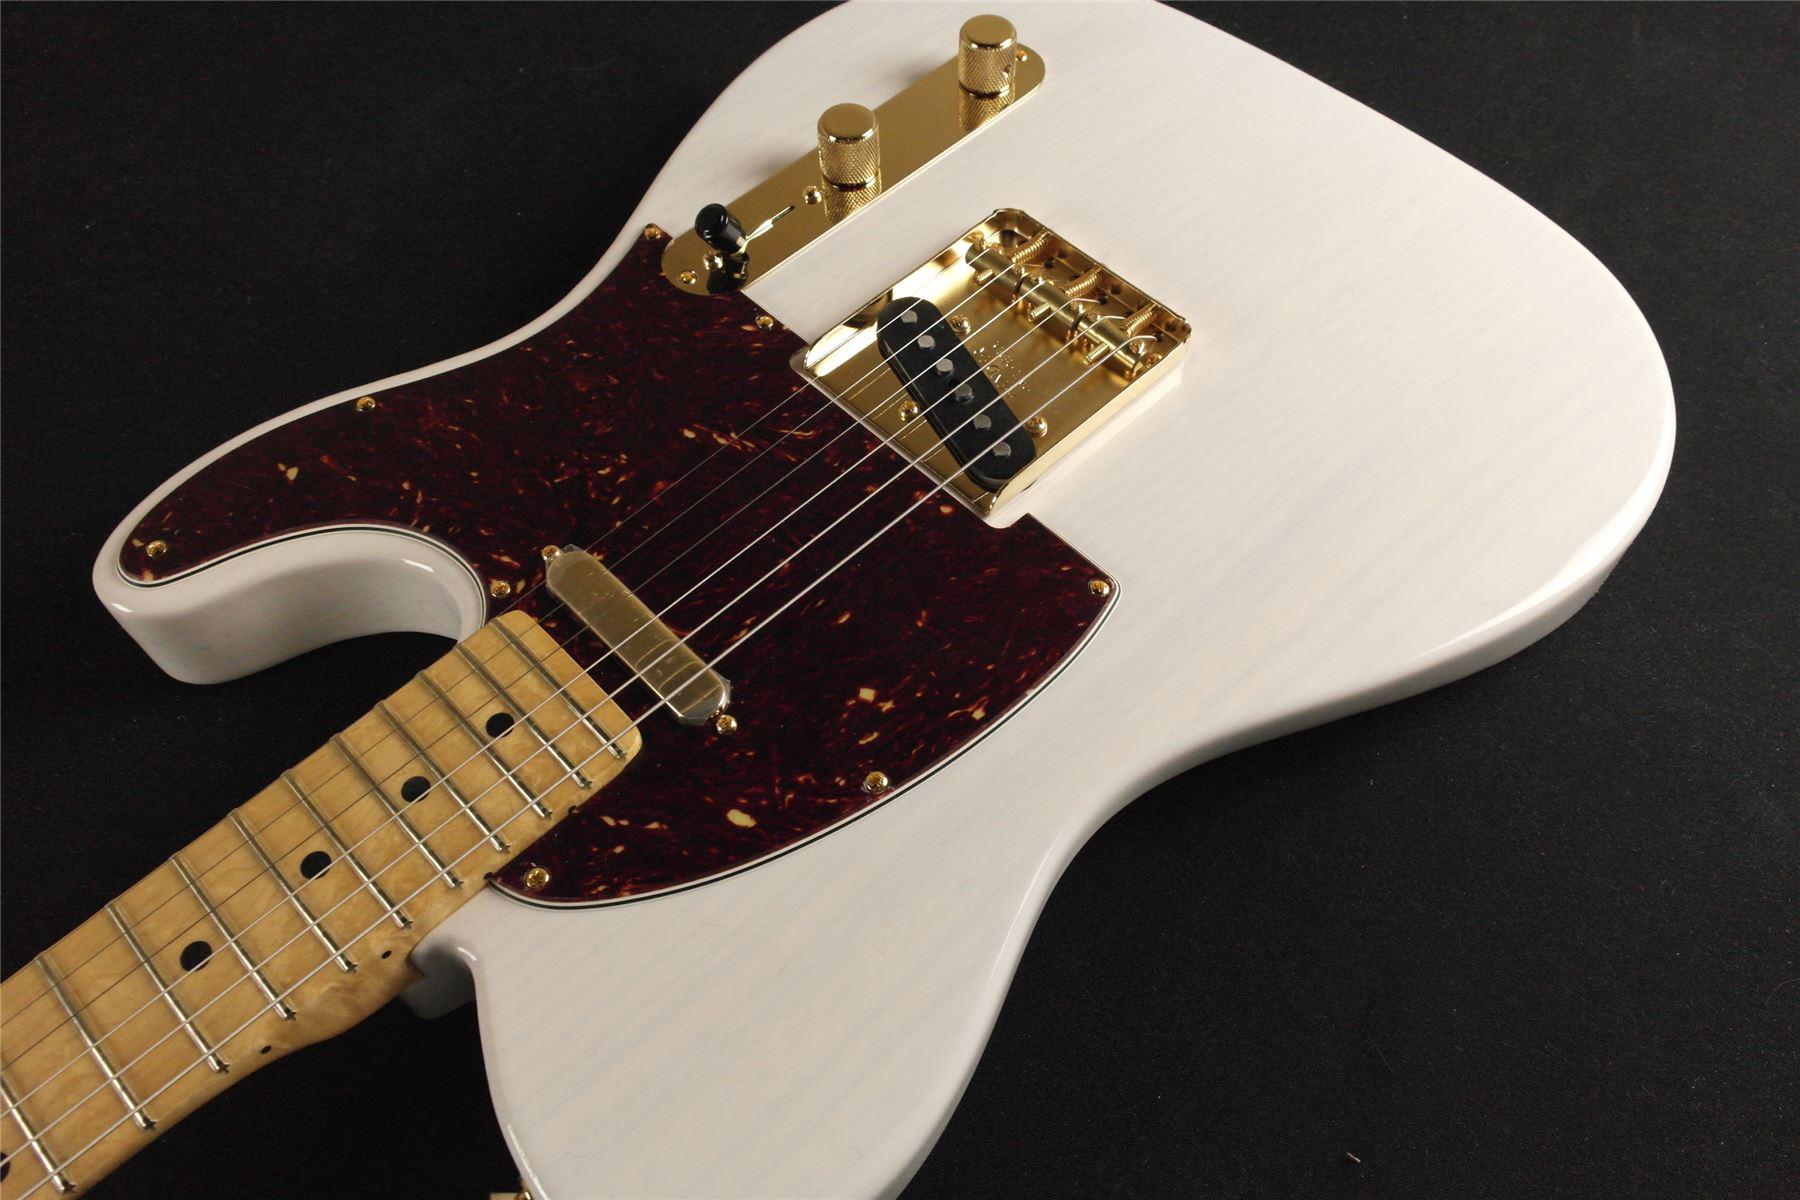 Fender limited edition select light ash telecaster white for Select light